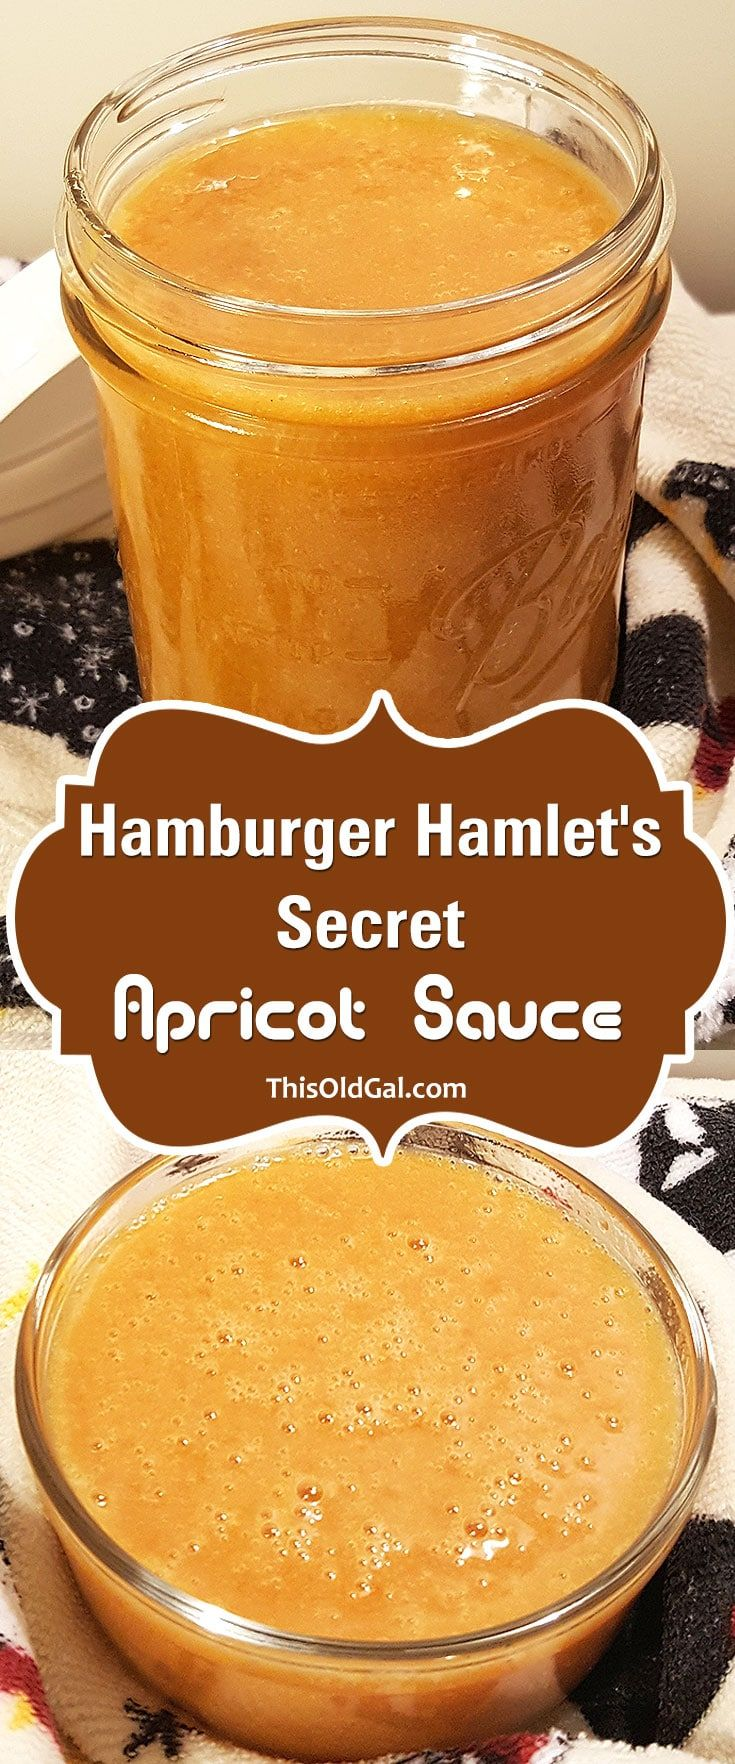 Hamburger Hamlet's Secret Apricot Sauce {Dipping Sauce} via @thisoldgalcooks